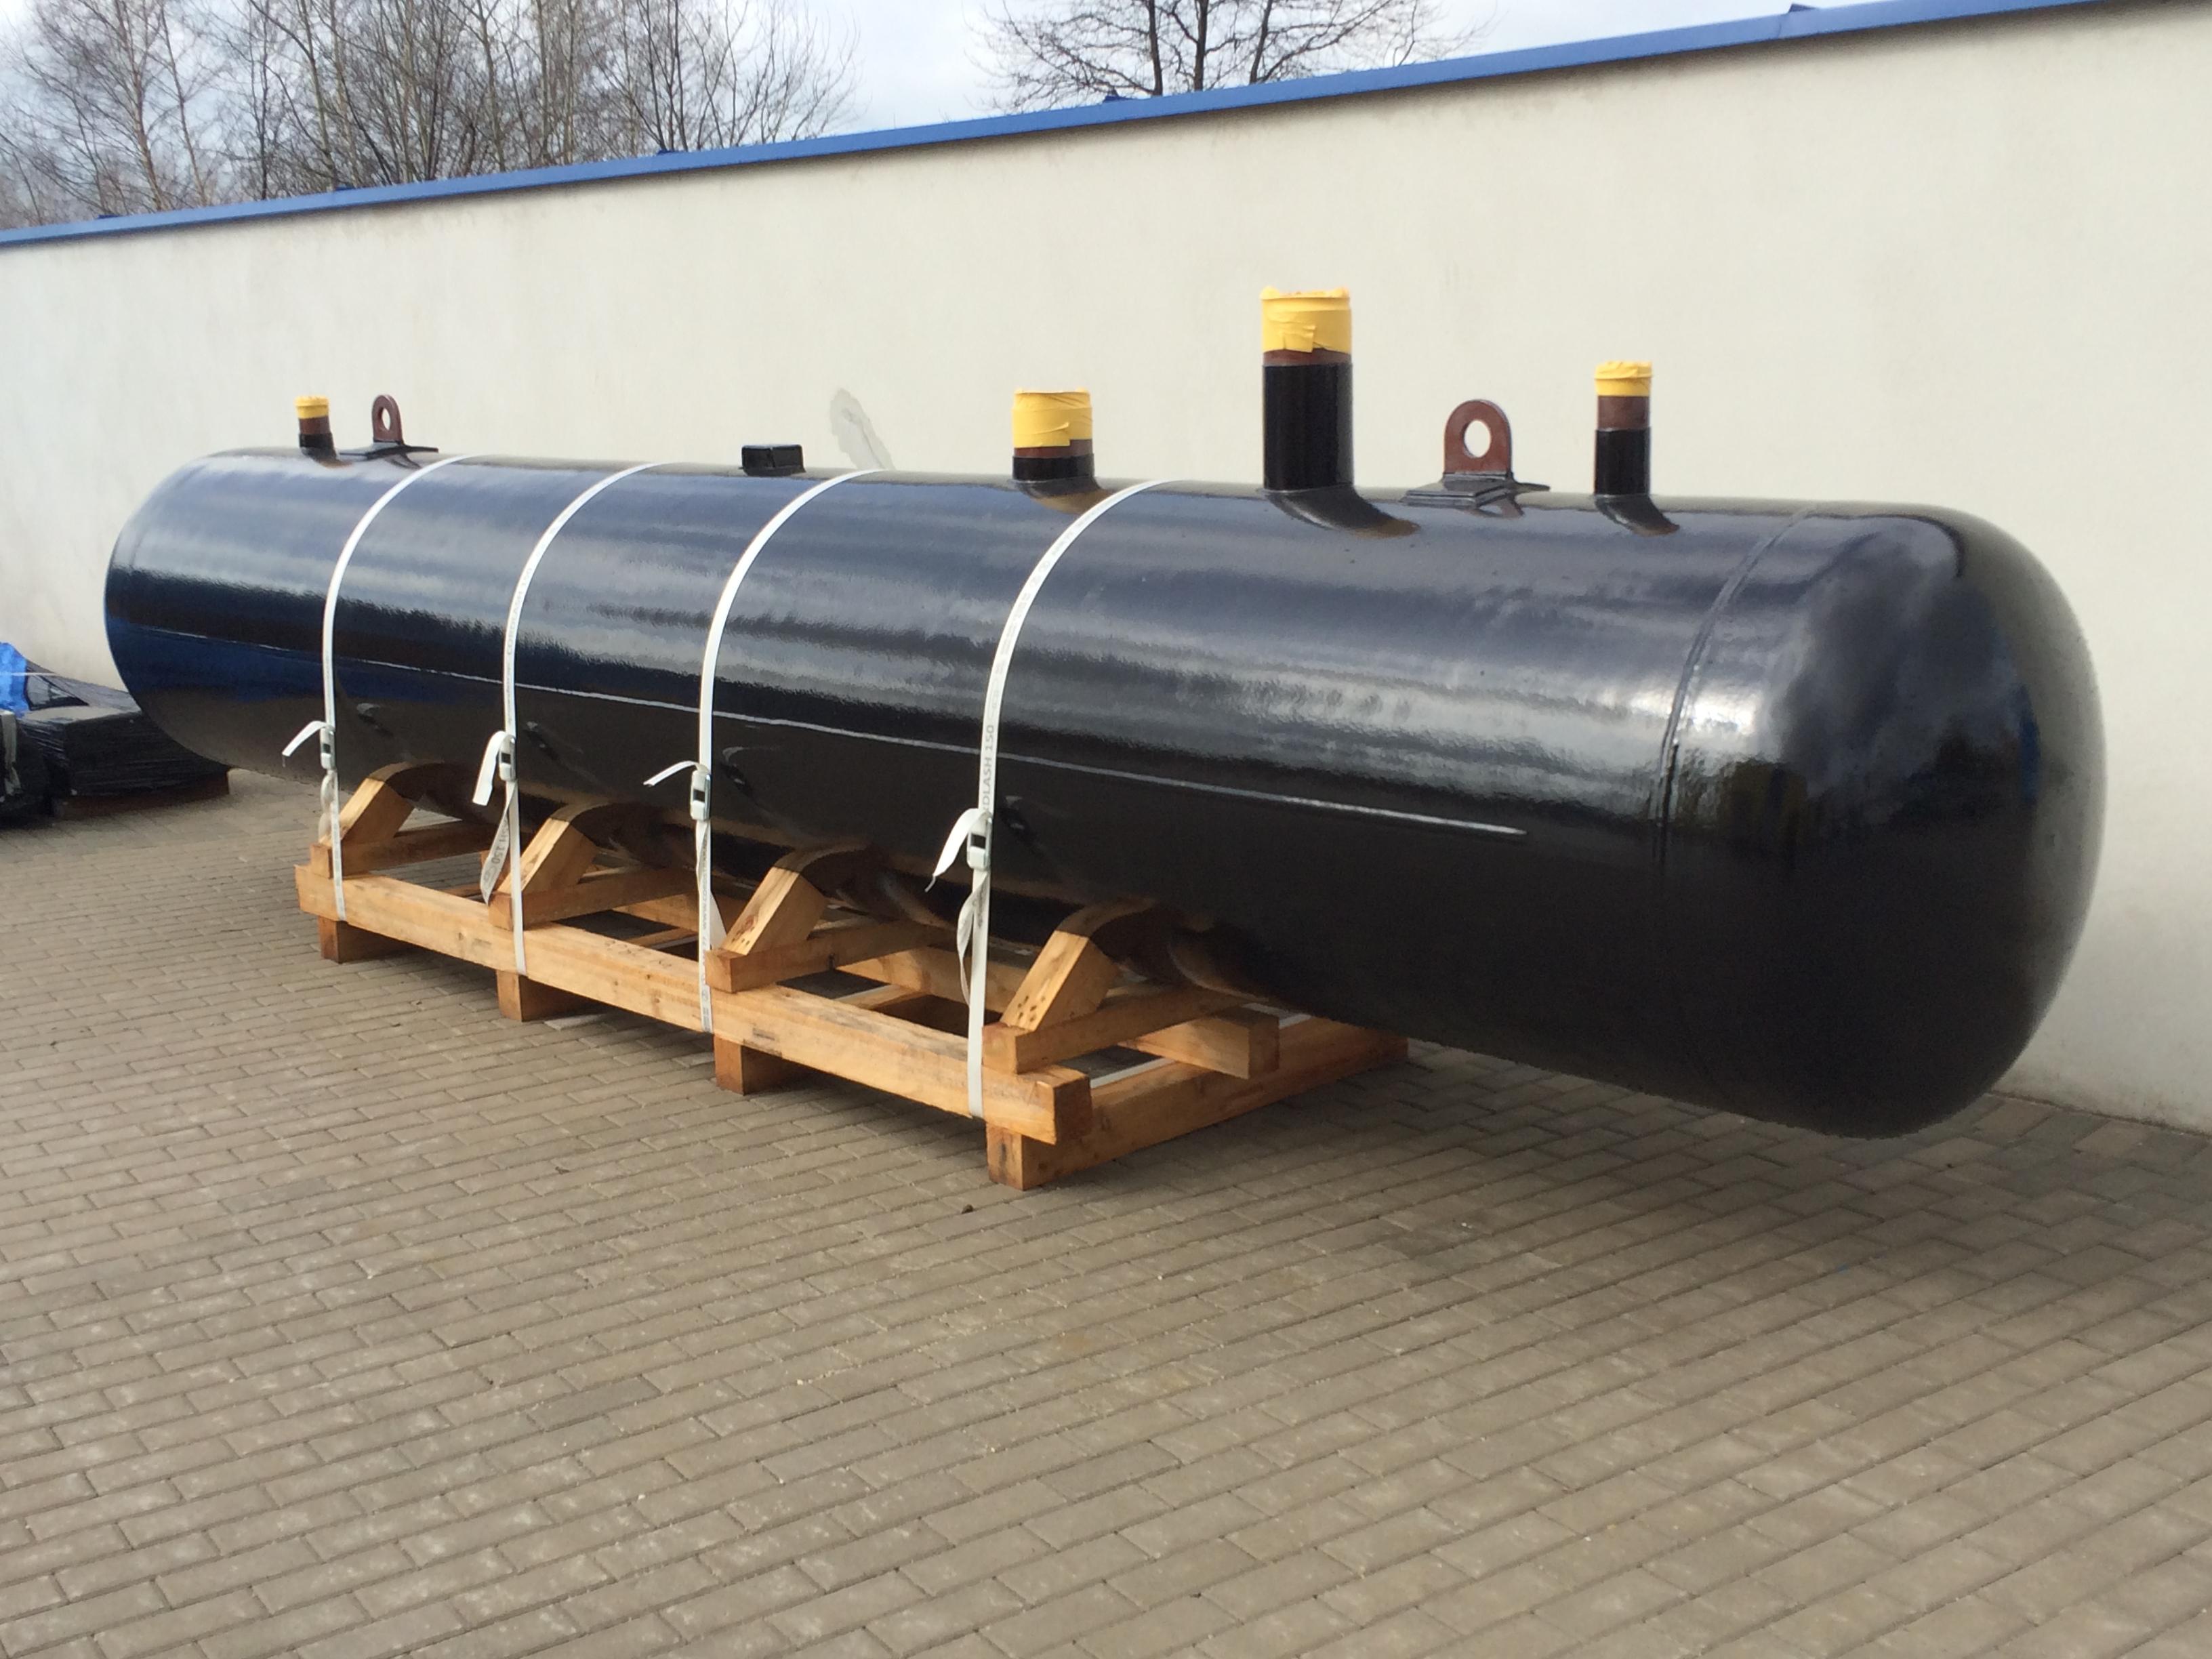 6. Zbiorniki ciśnieniowe